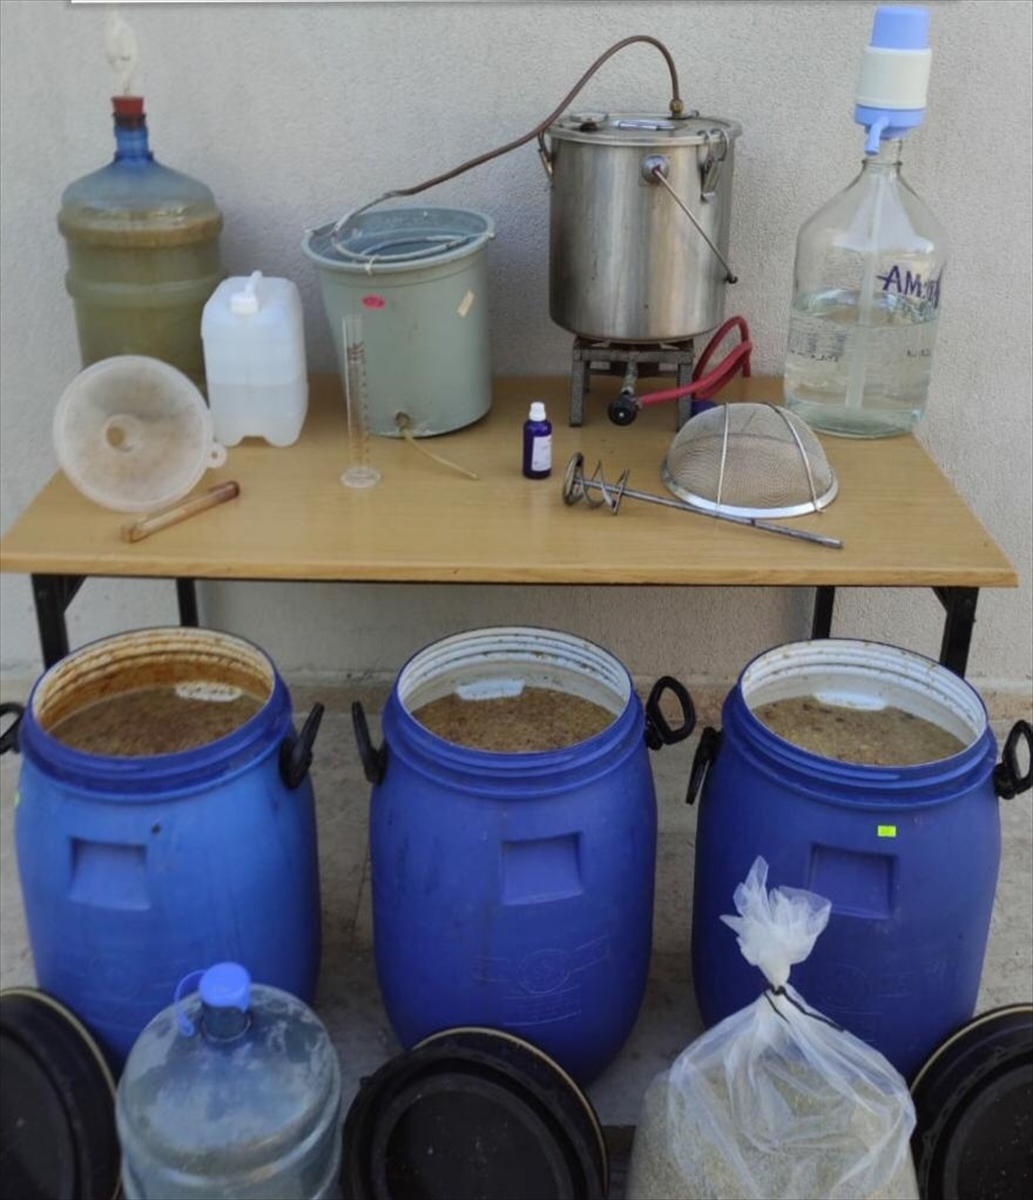 Muğla'da 226 litre sahte içki ele geçirildi